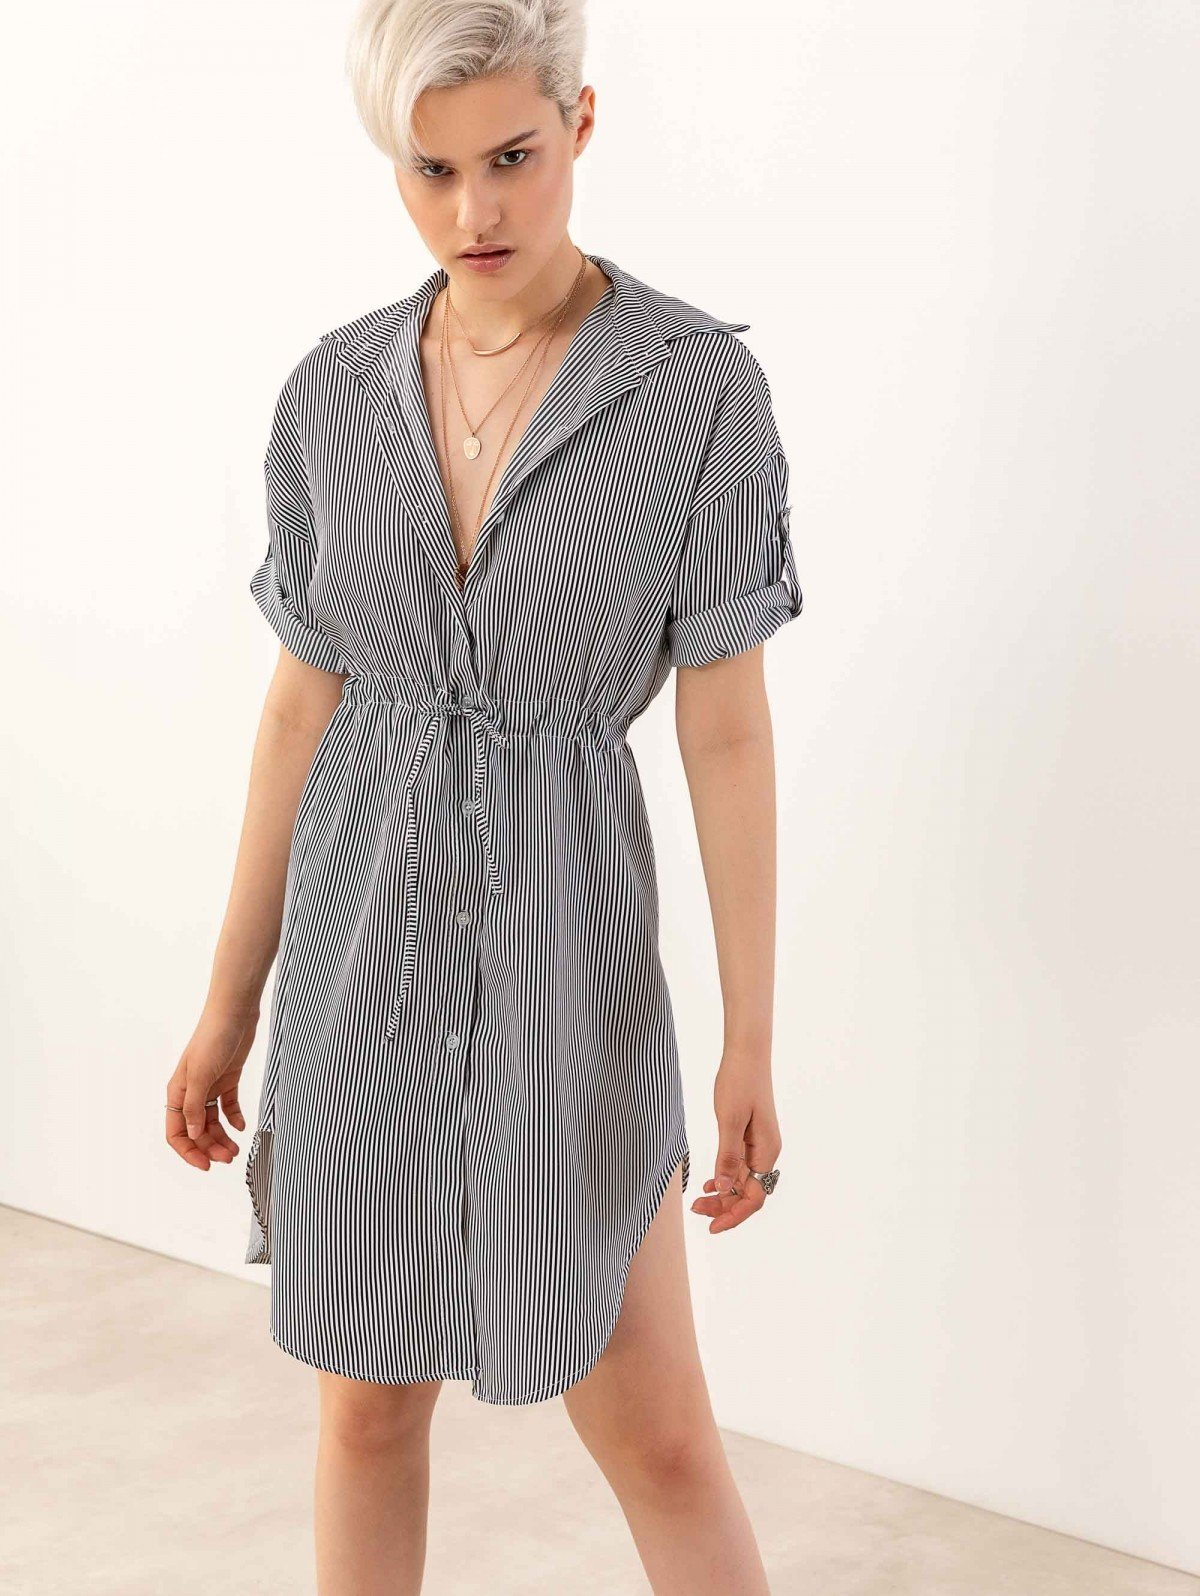 1629378a0461 TheFashionProject Φόρεμα πουκάμισο σεμιζιέ με ρίγες - Λευκό  Μαύρο